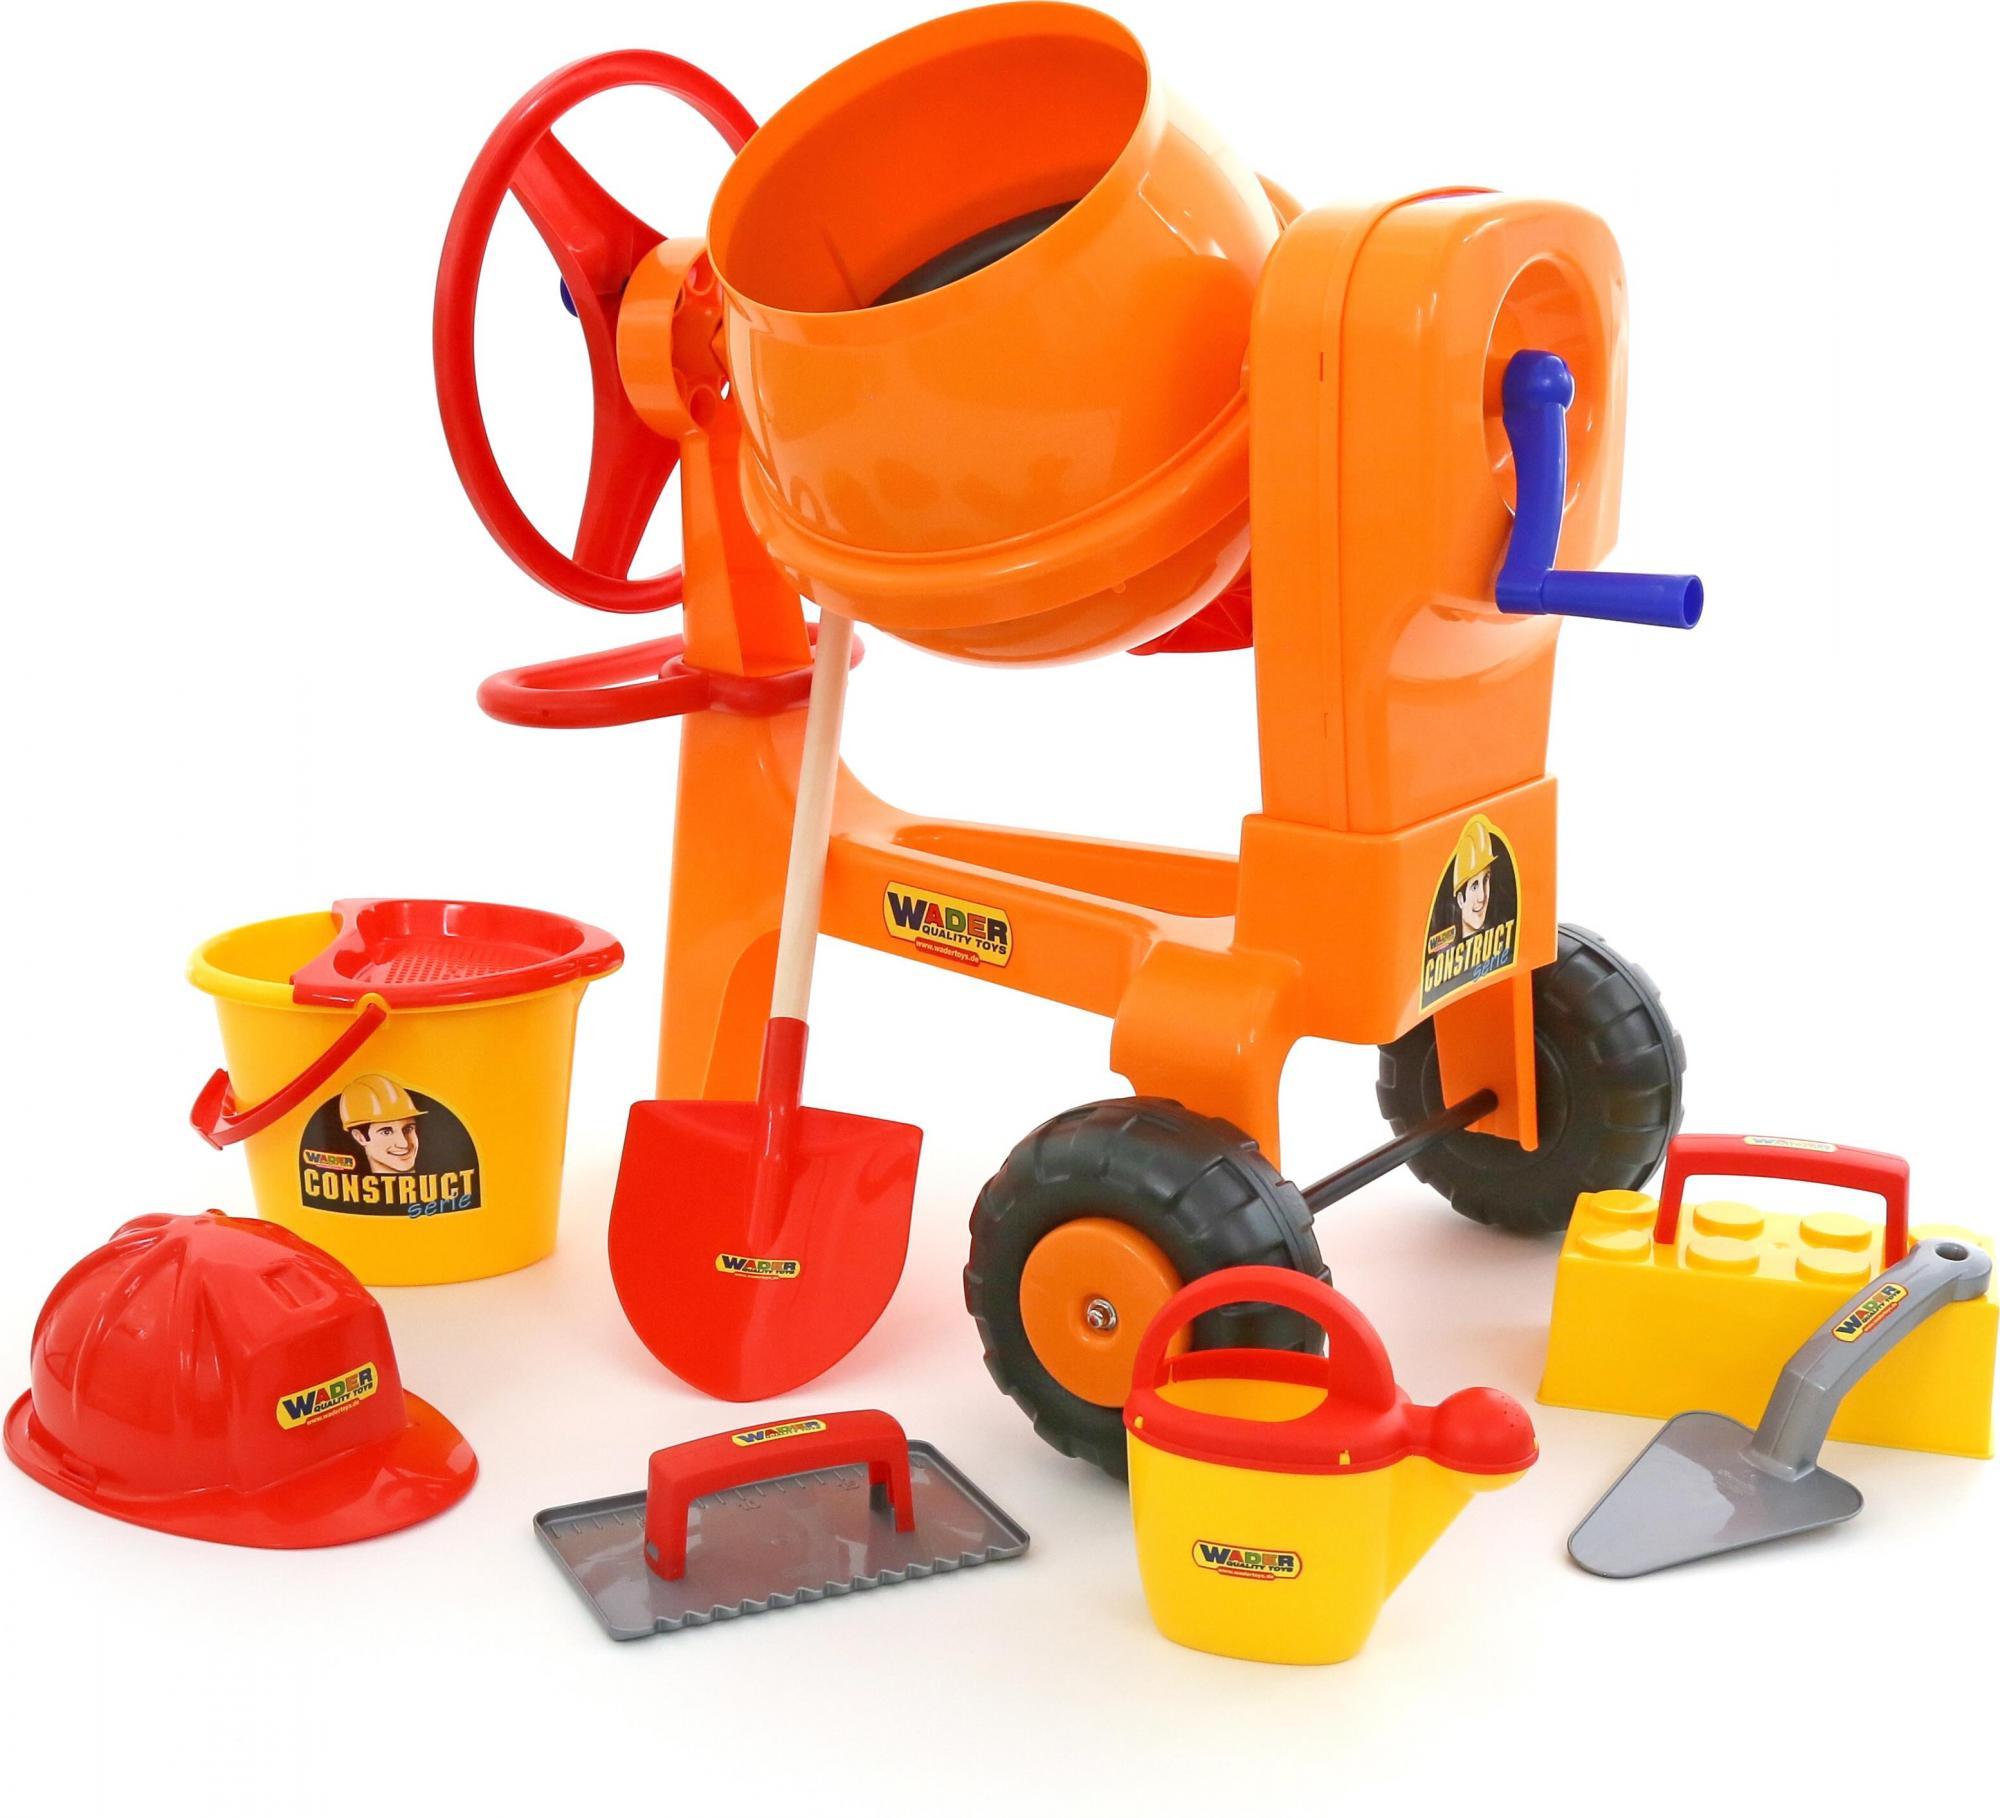 Бетономешалка Construct + Набор каменщика - Детские мастерские, инструменты, артикул: 156575